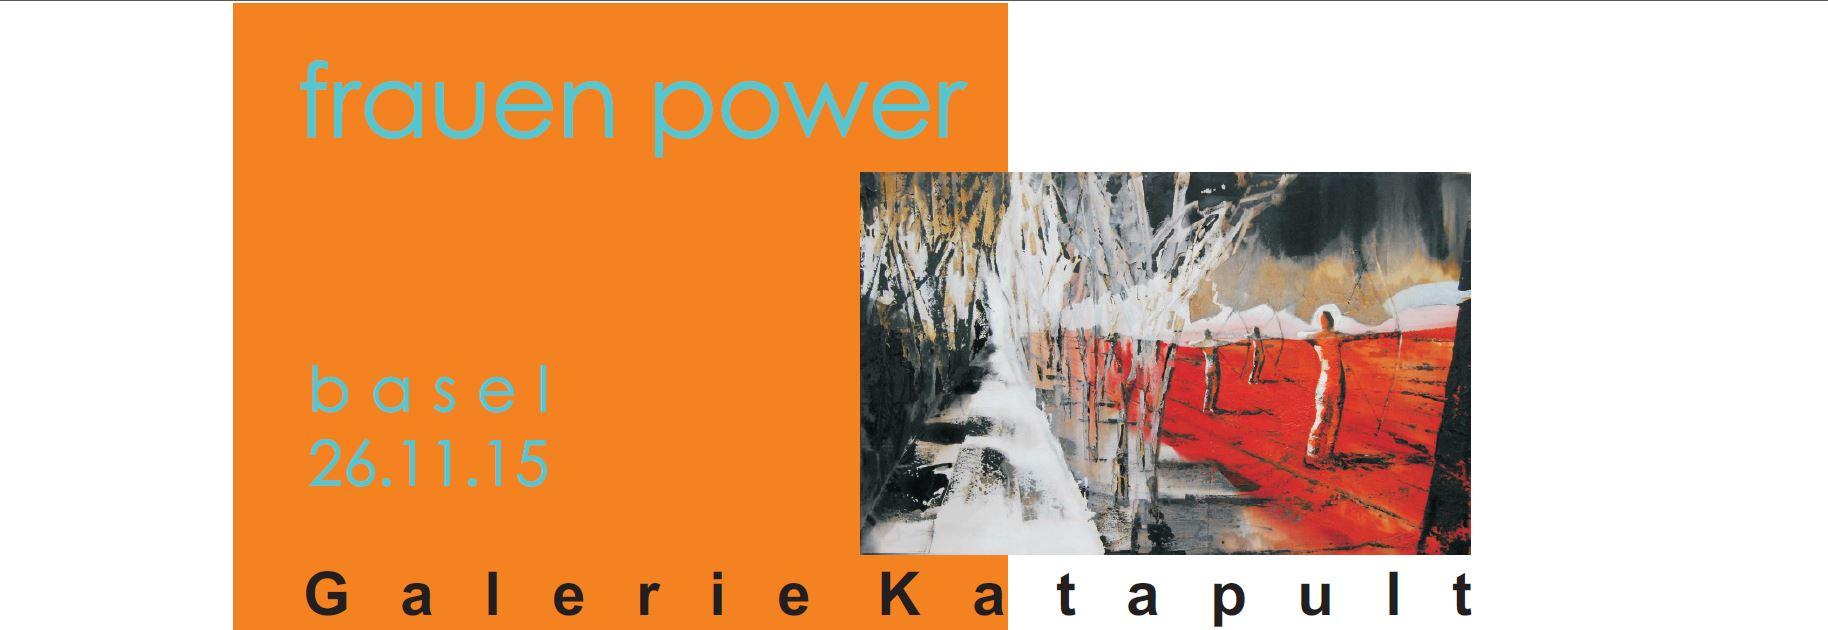 Ausstellung Galerie Katapult Frauenpower